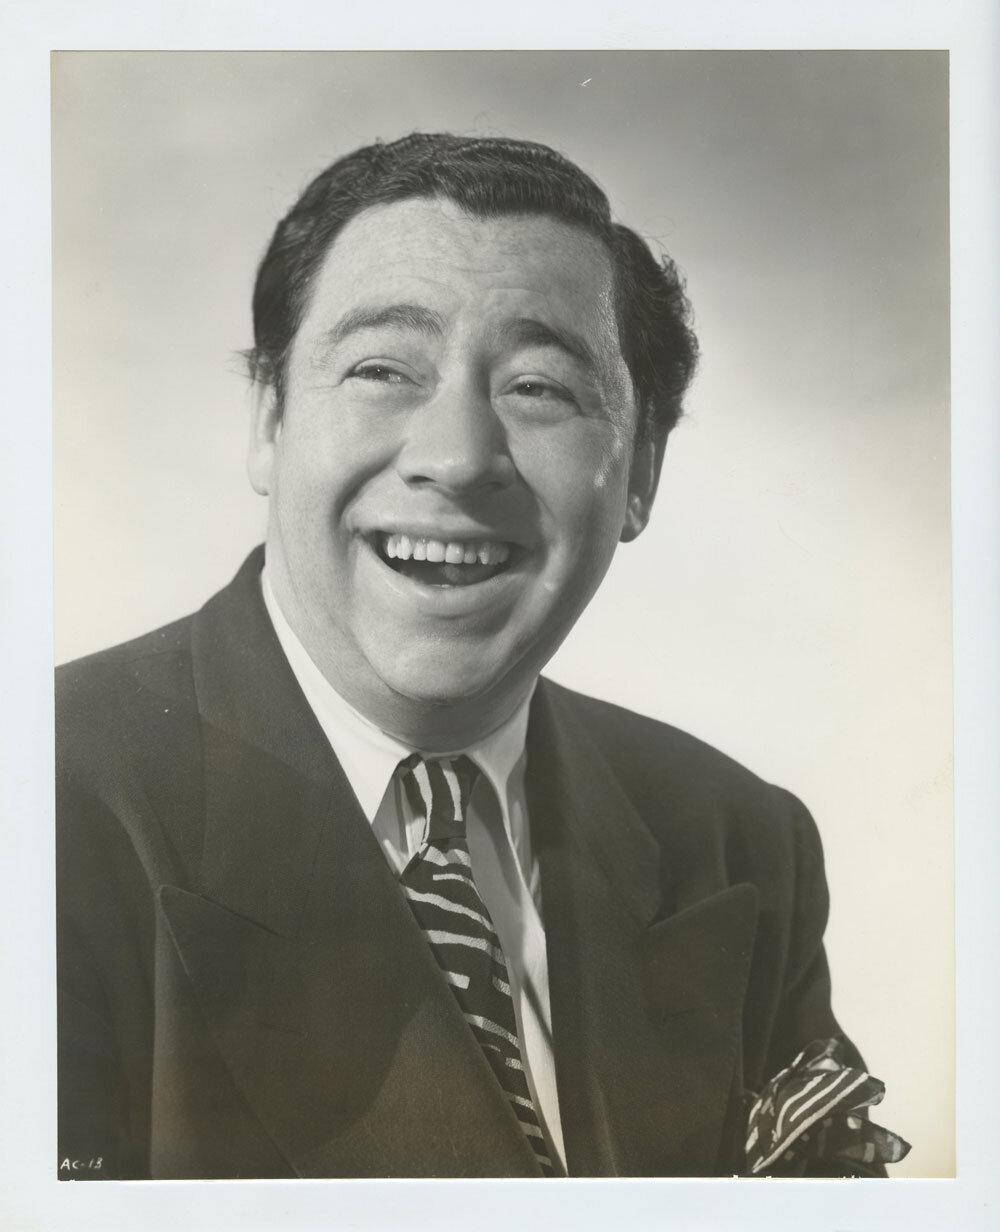 Alan Carney Photograph 1943 Mr. Lucky Original Vintage